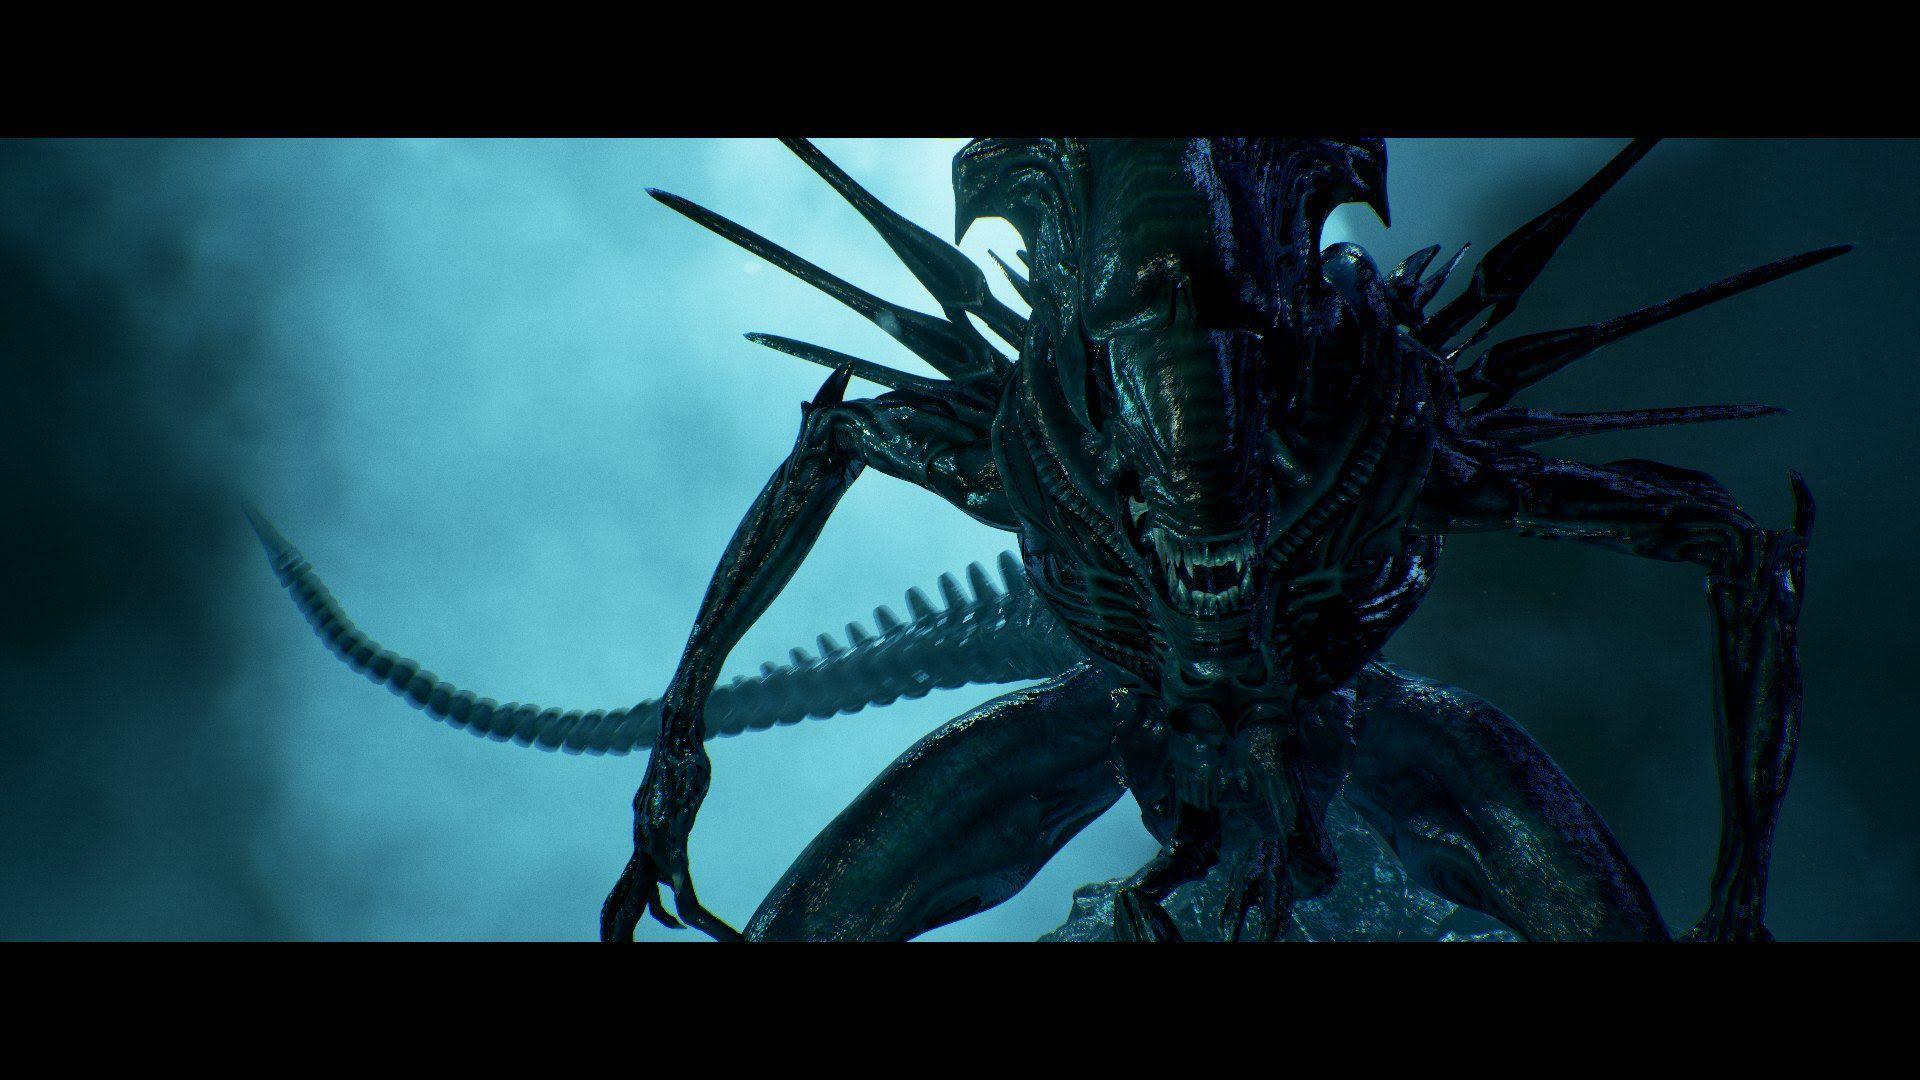 Stranger Things Wallpaper Cute Alien Queen Realtime On Unreal Engine 4 Art